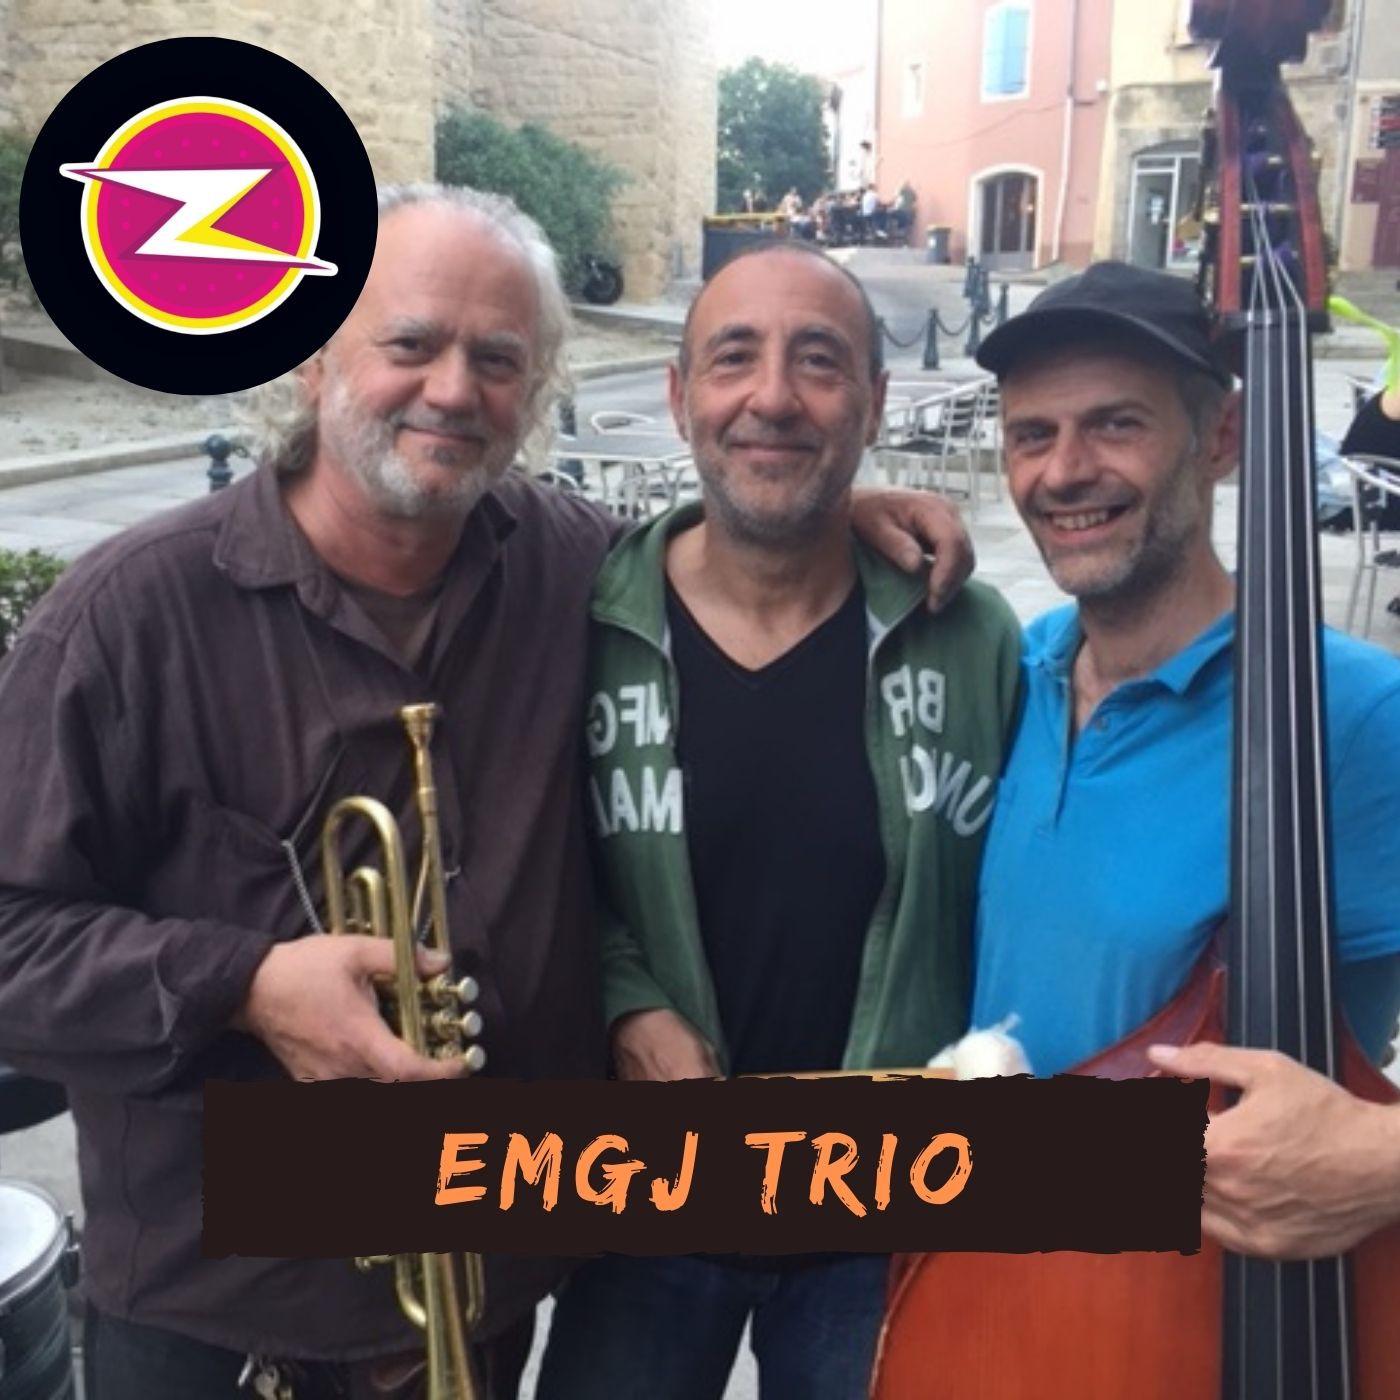 EMGJ Trio